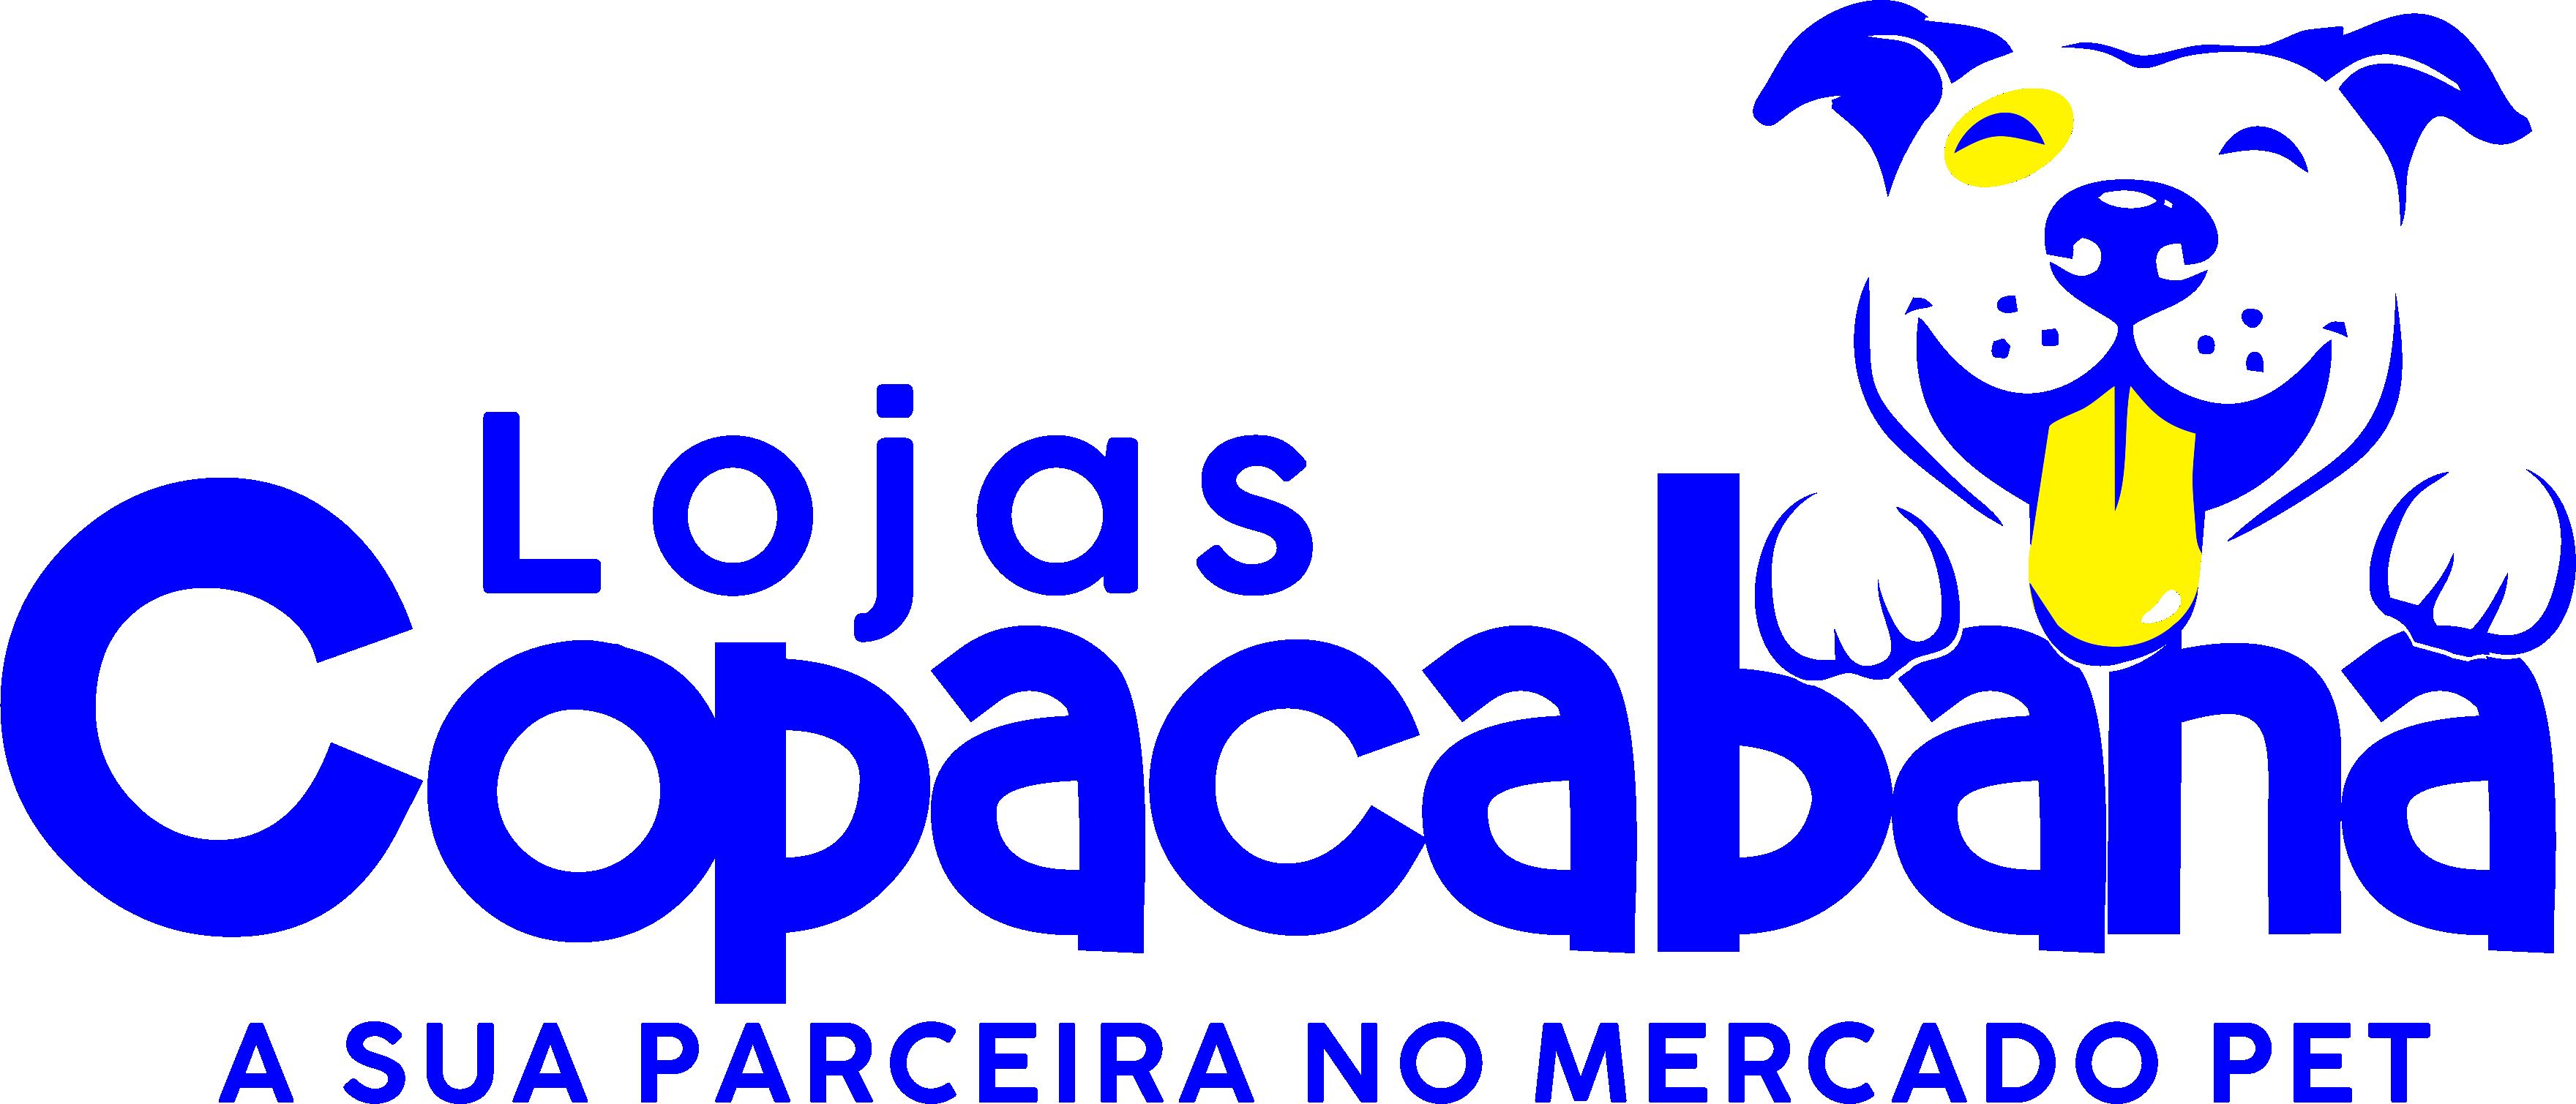 Lojas Copacabana